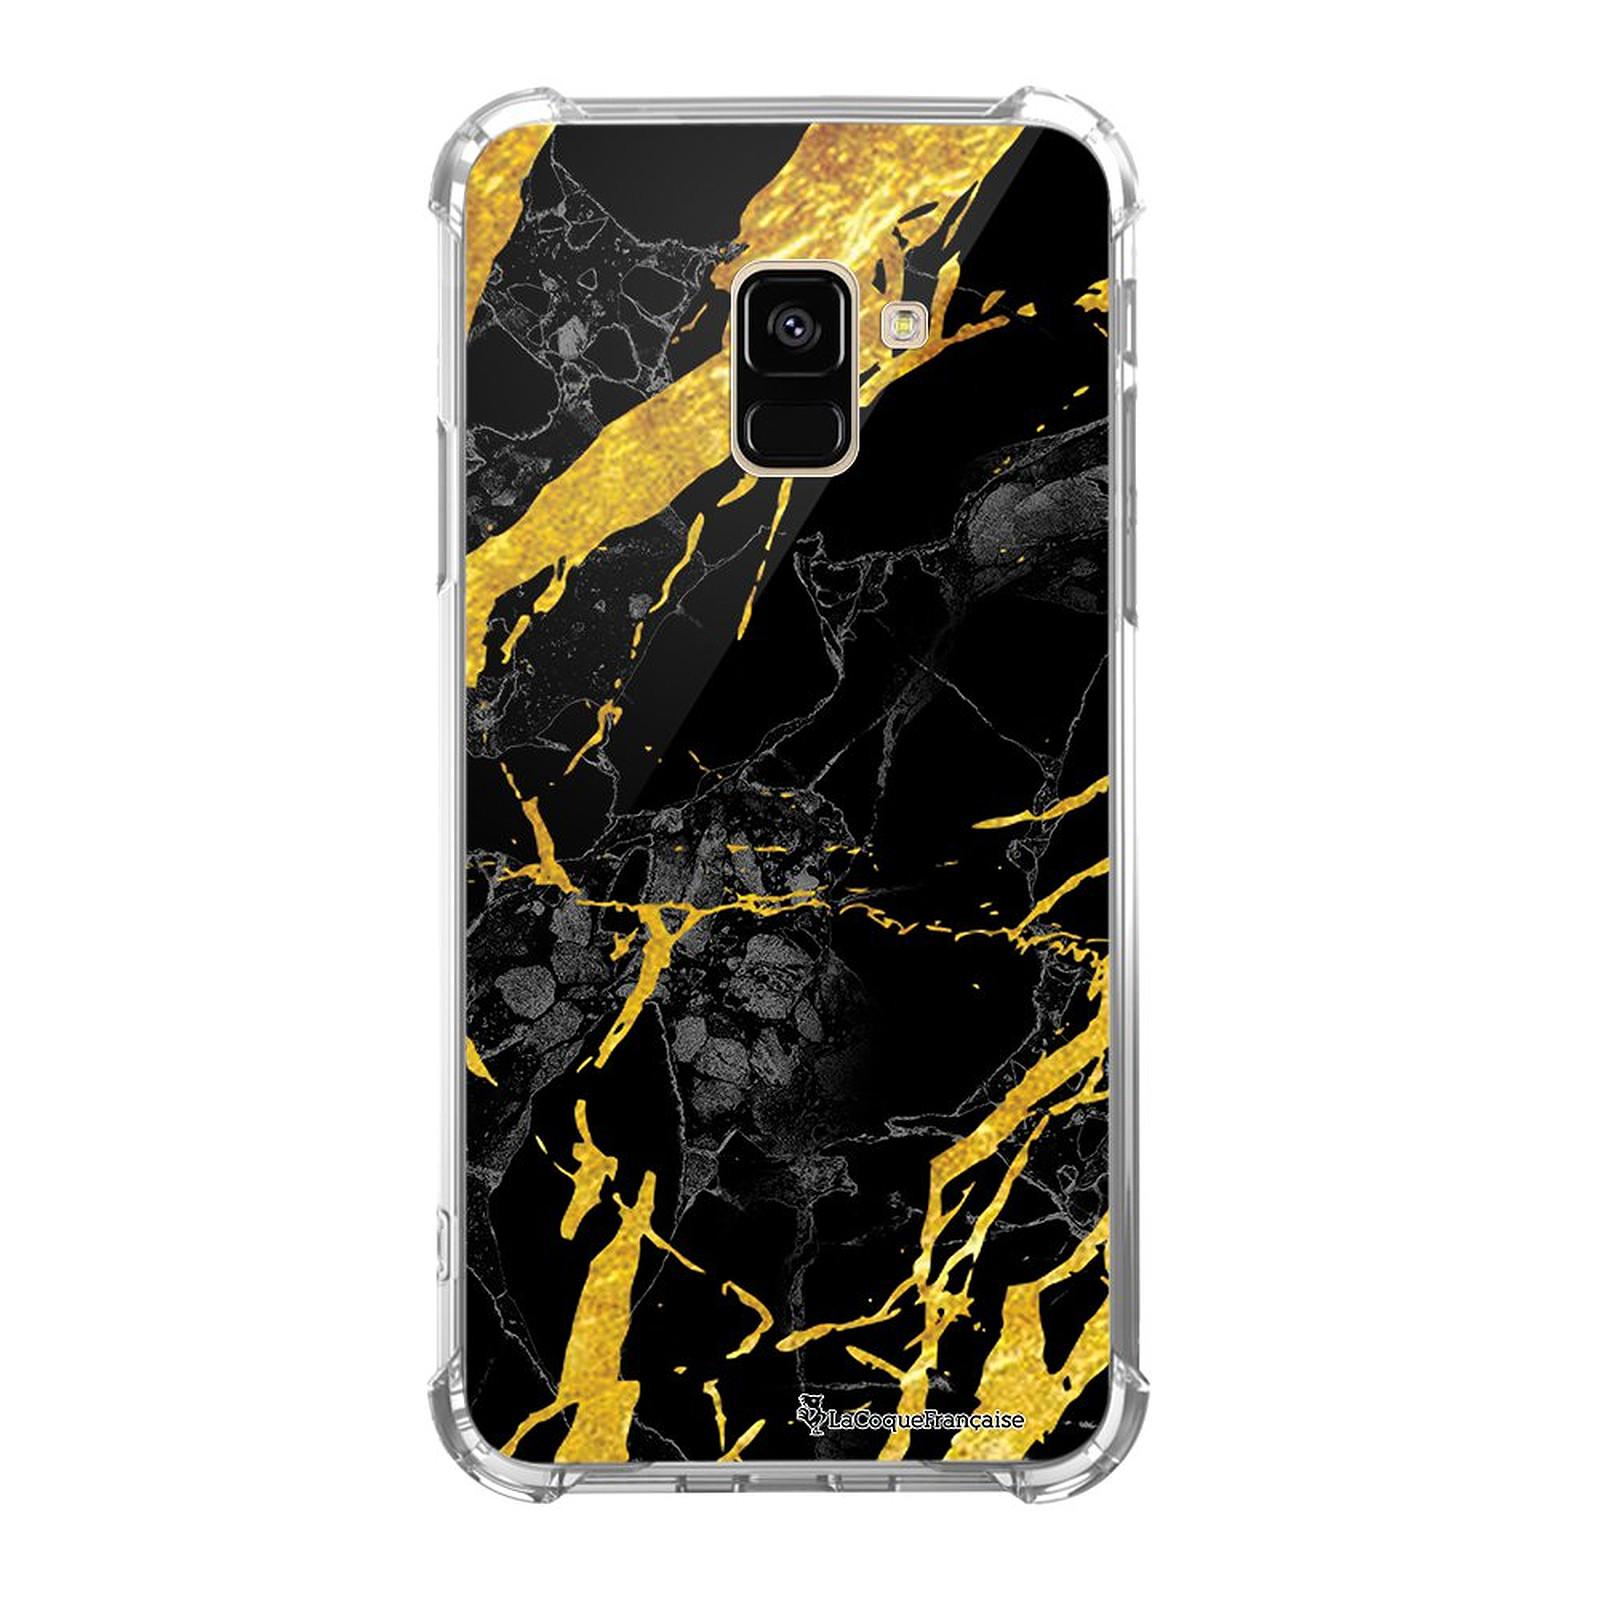 LA COQUE FRANCAISE Coque Samsung Galaxy A8 2018 anti-choc souple angles renforcés Marbre noir